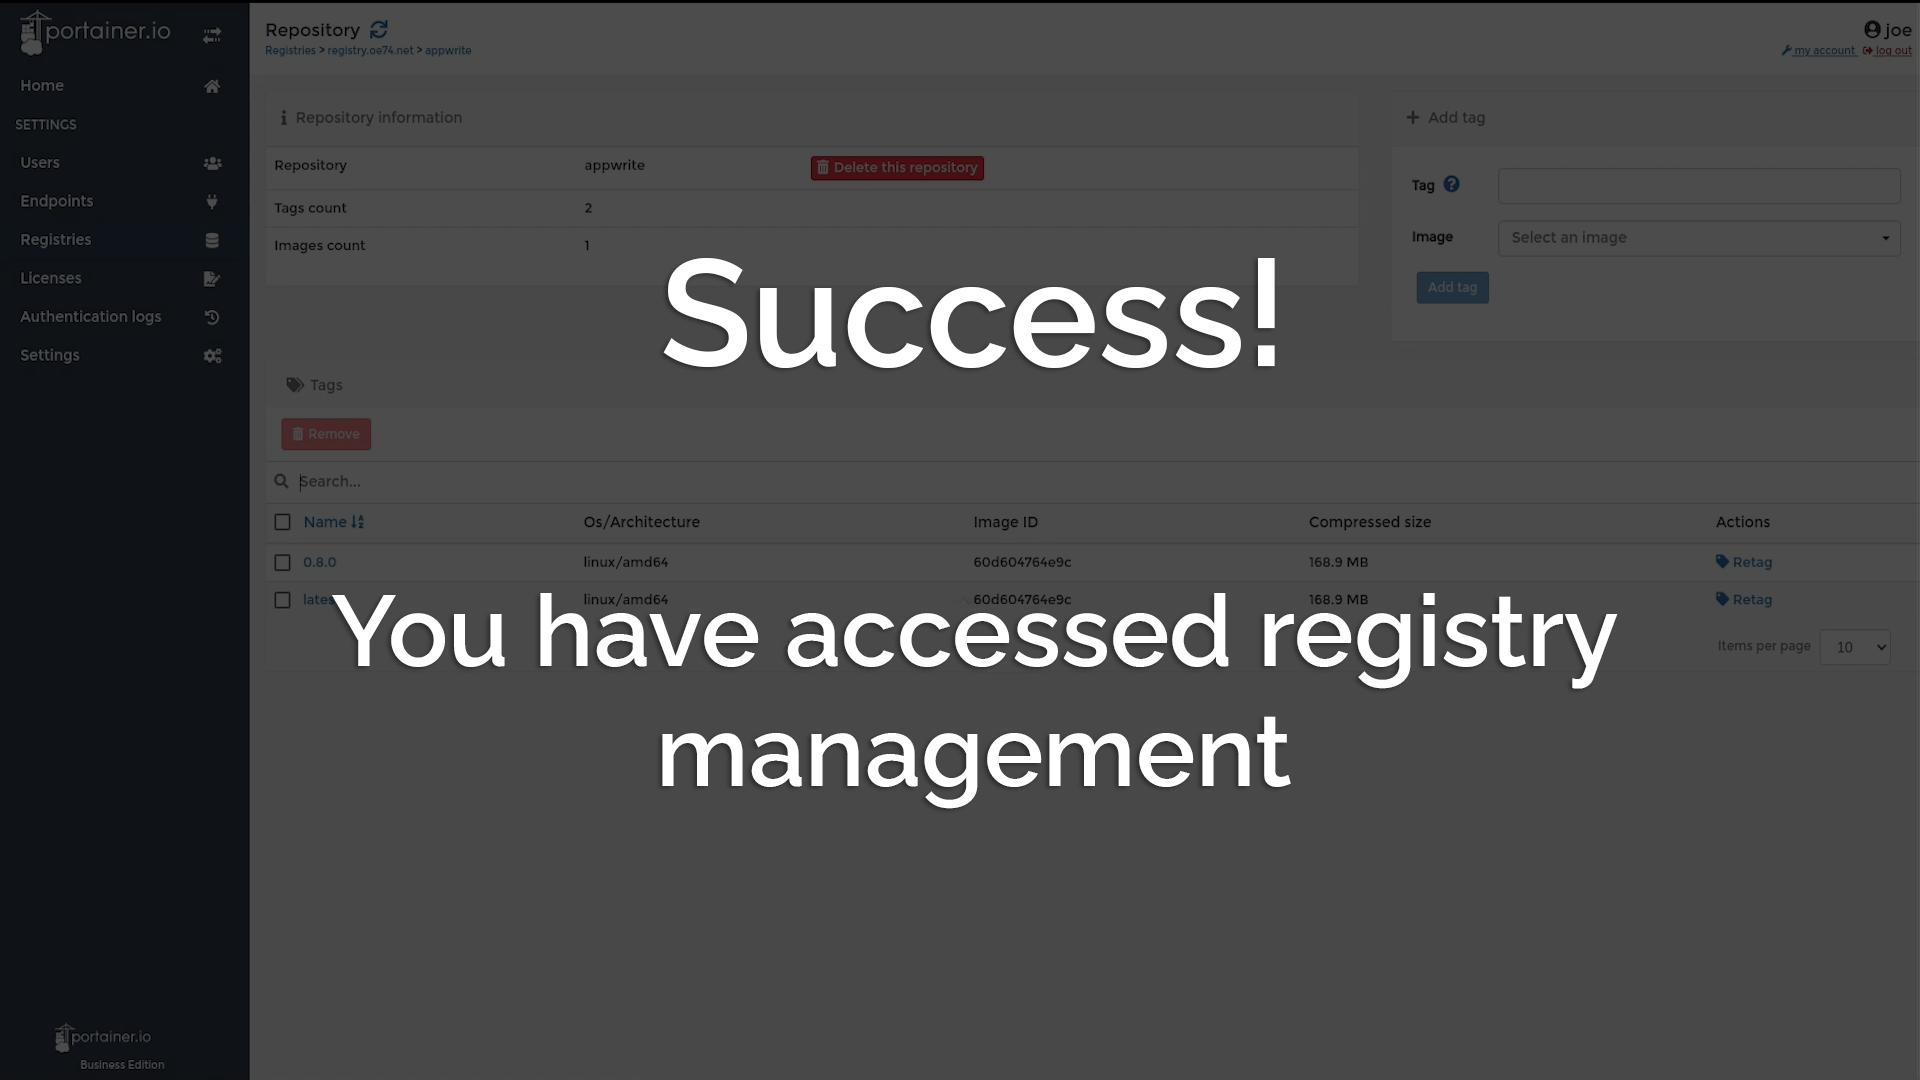 Success! You have registry management